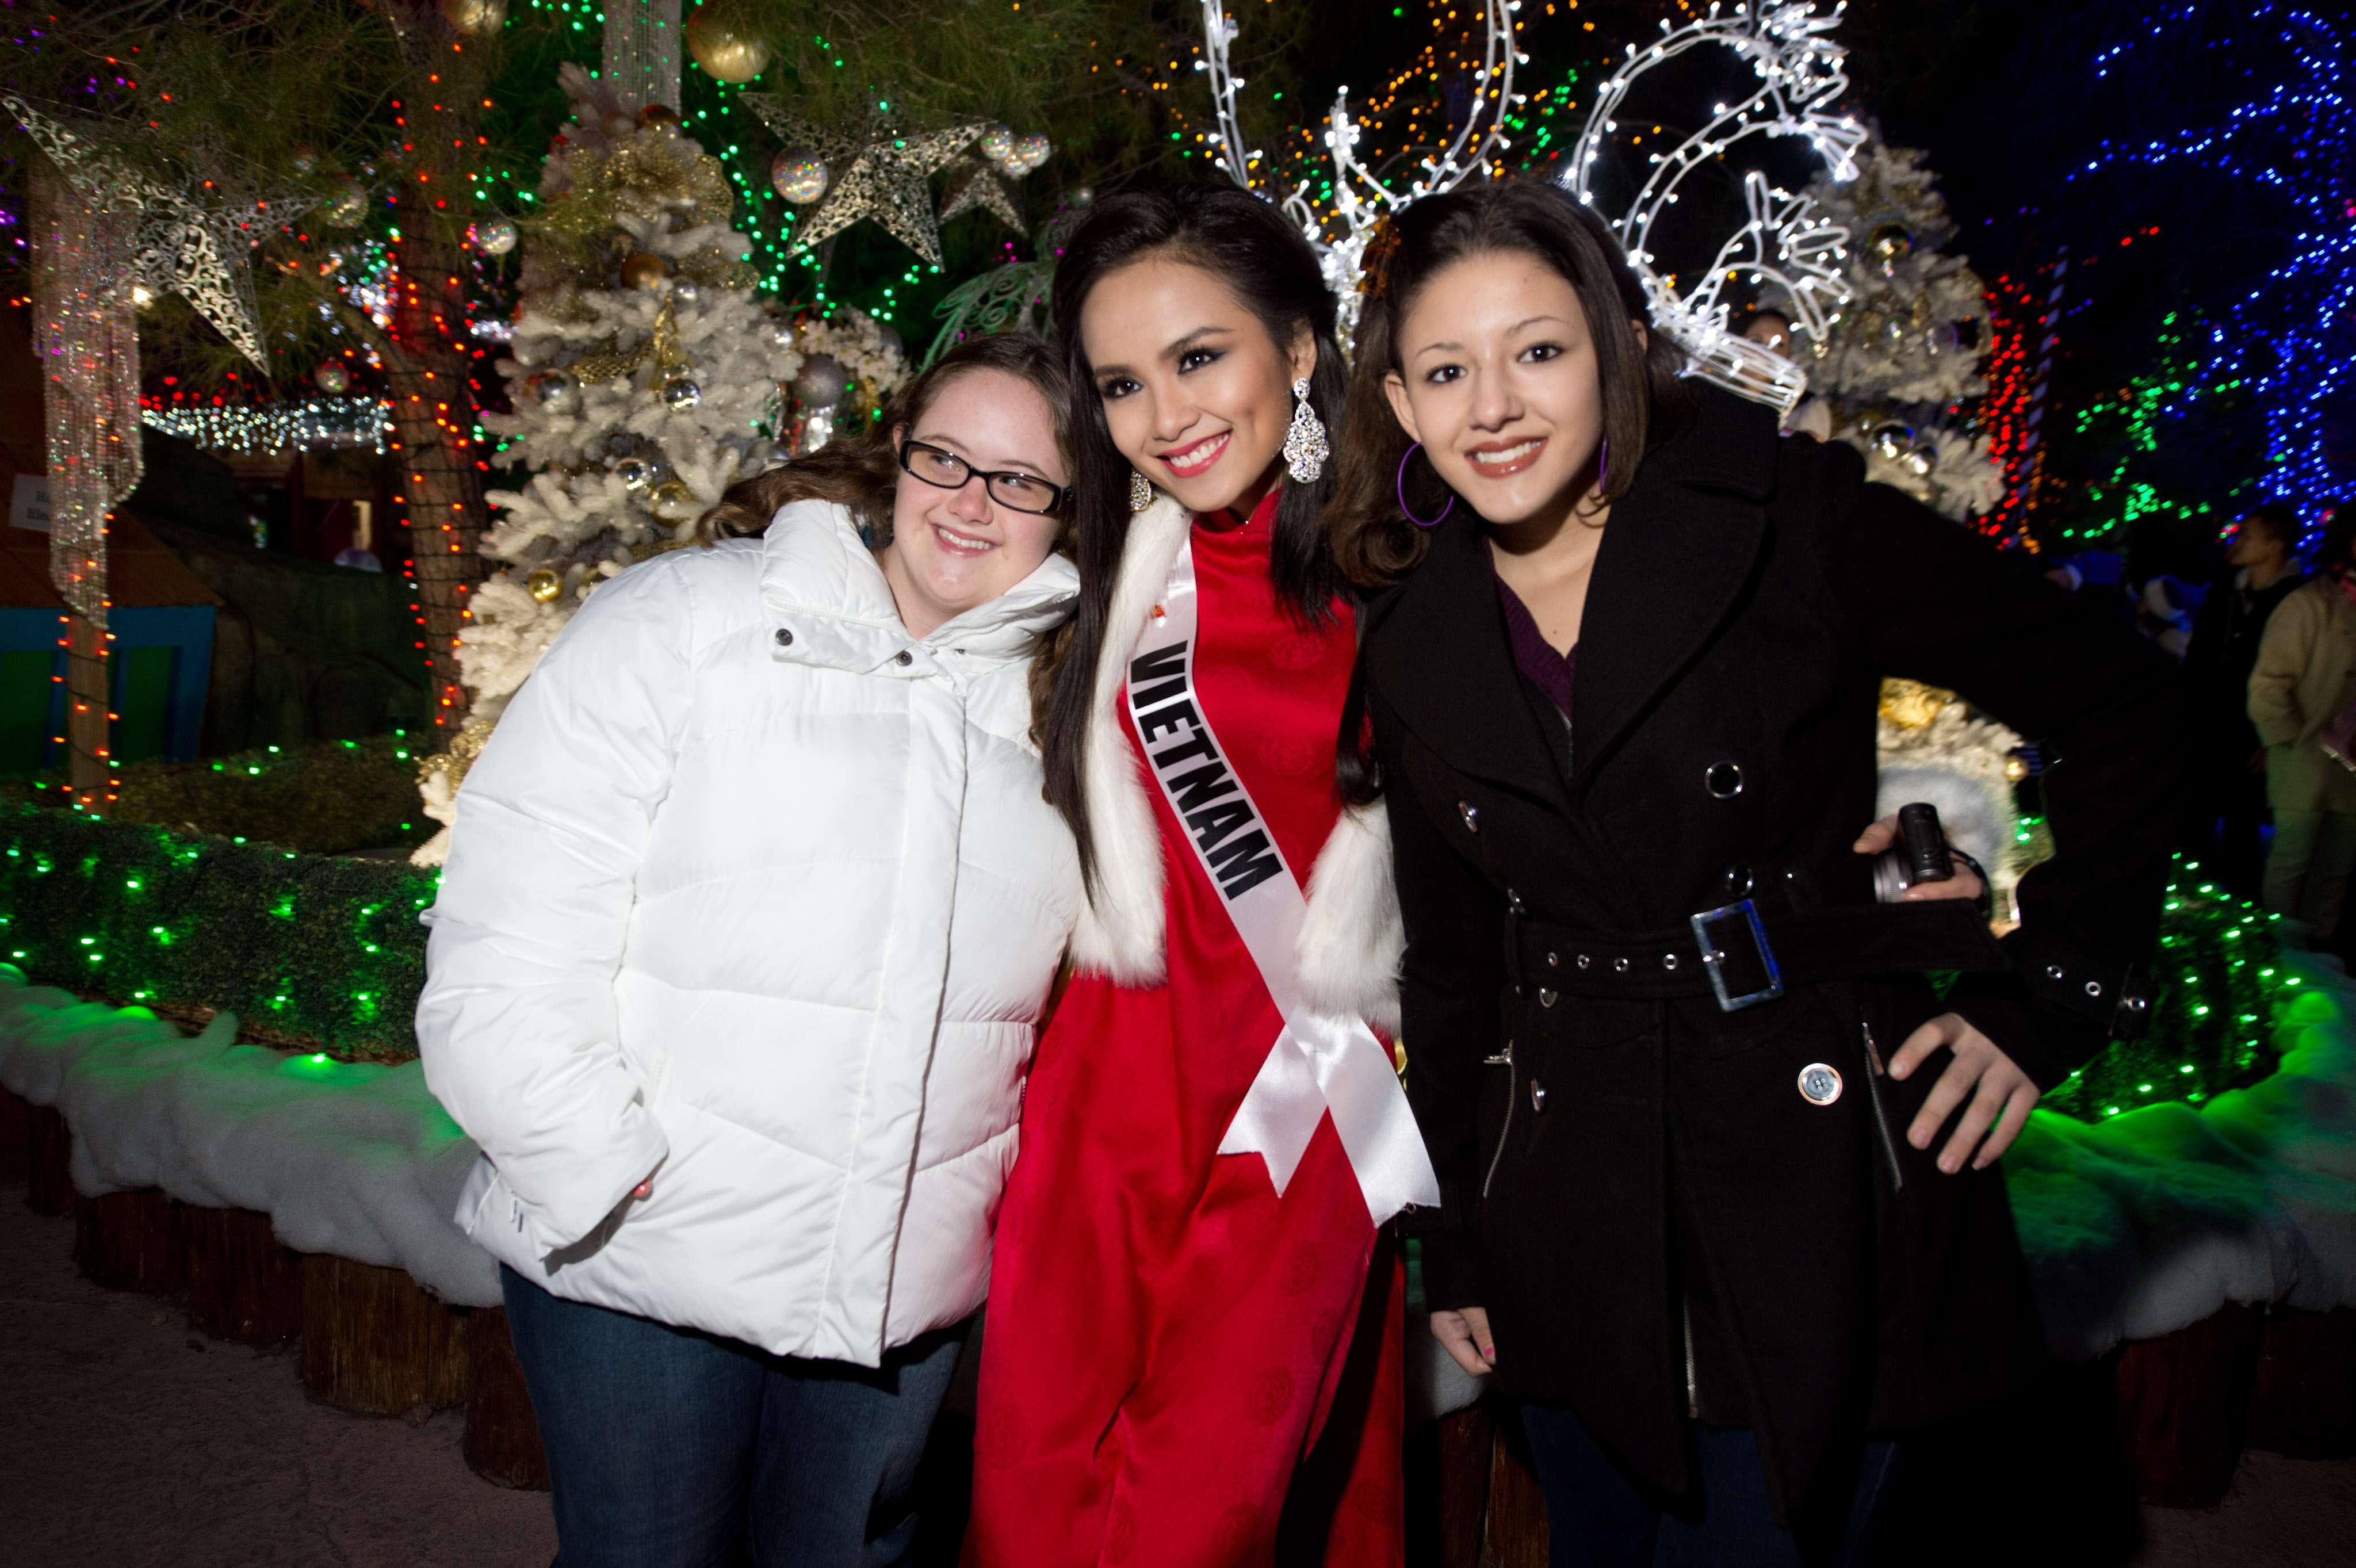 Candidatas a Miss Universo participam de evento beneficente